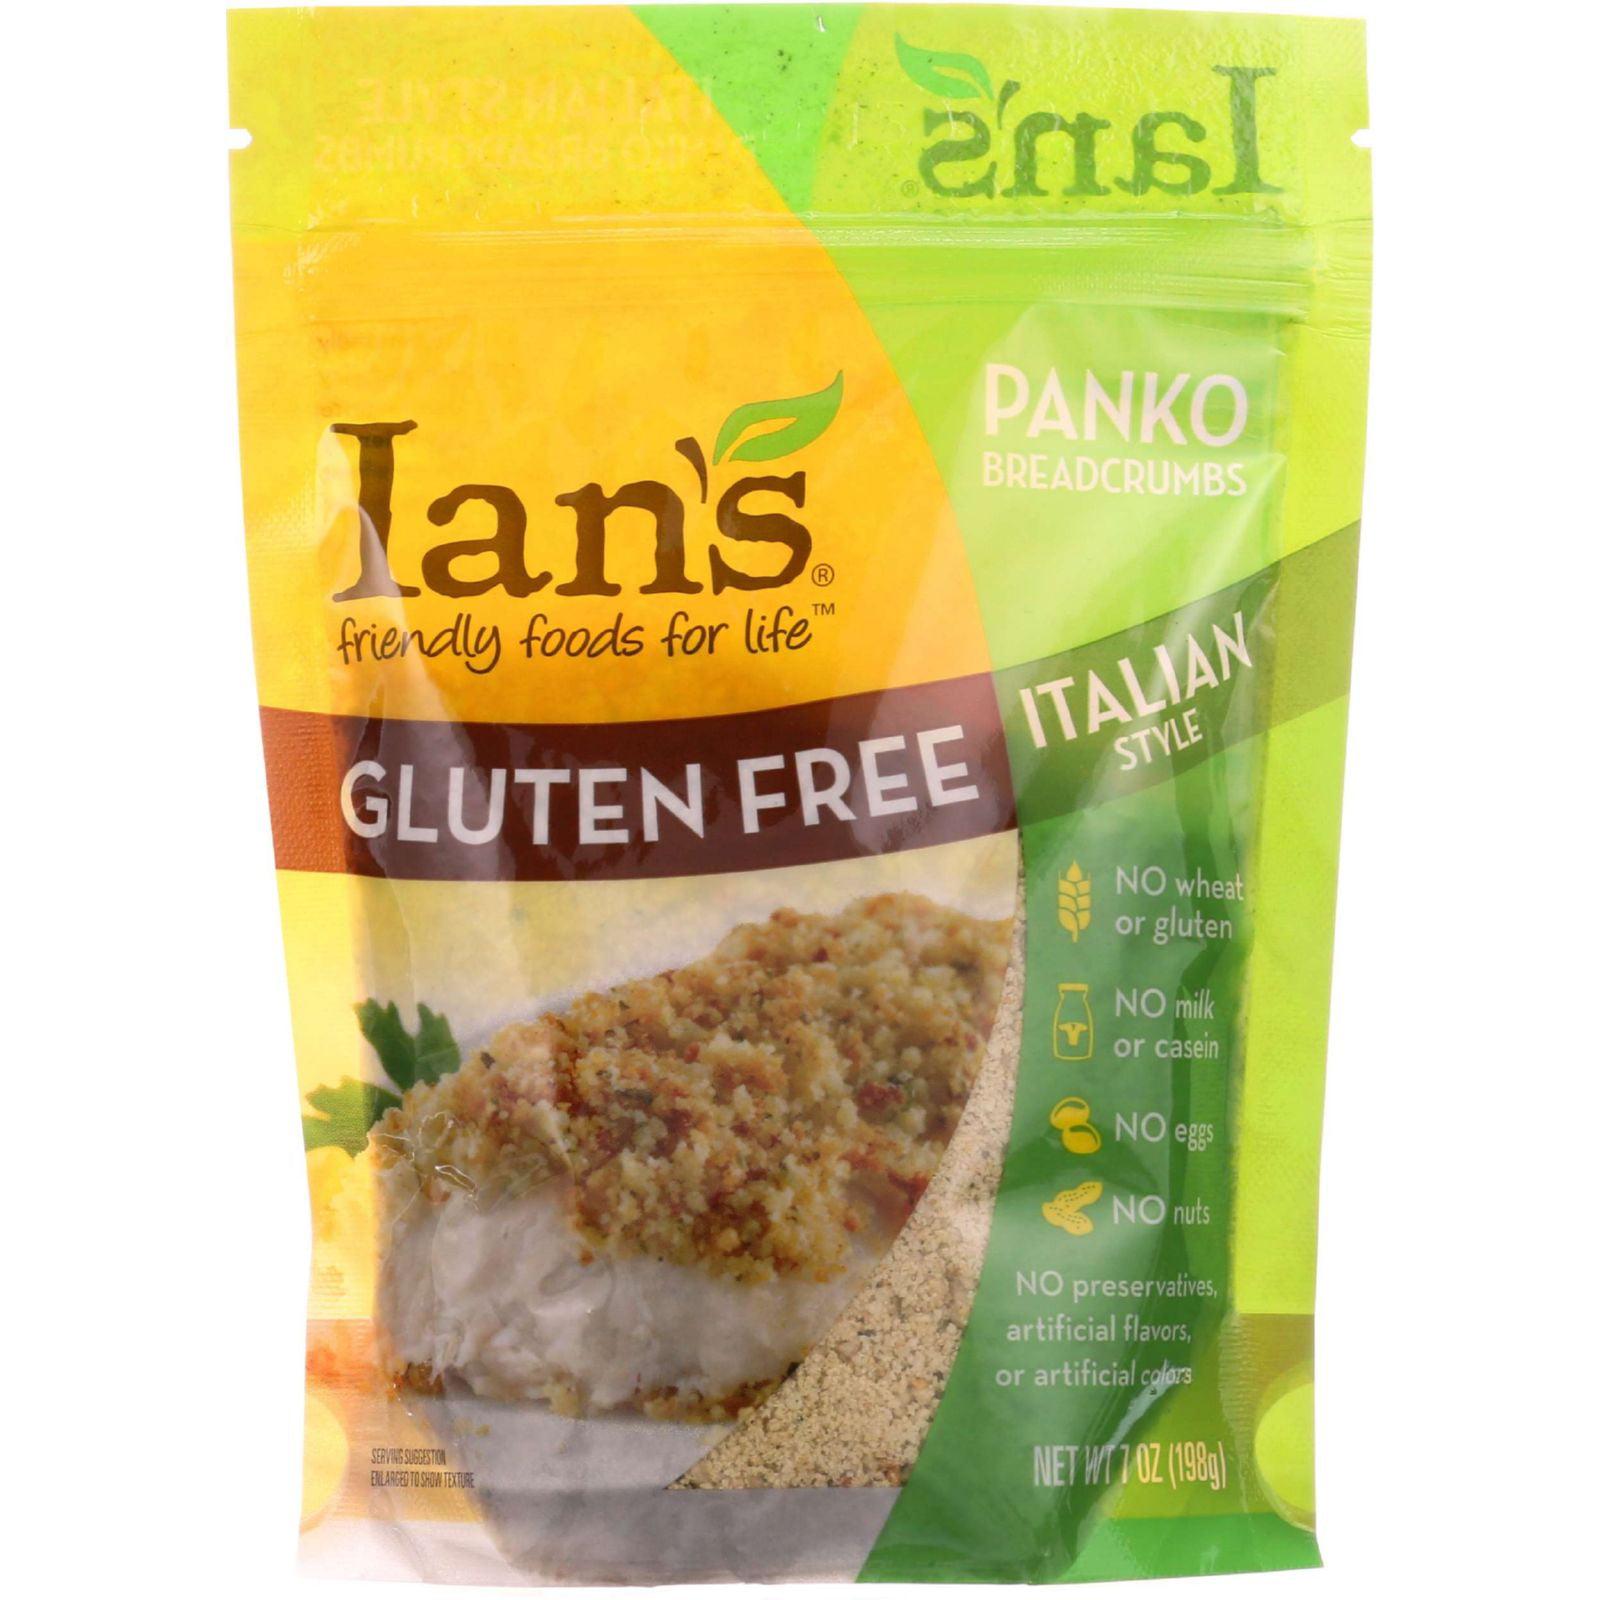 Ians Natural Foods Bread Crumbs Panko Italian Style Gluten Free 7 oz case of 8 by